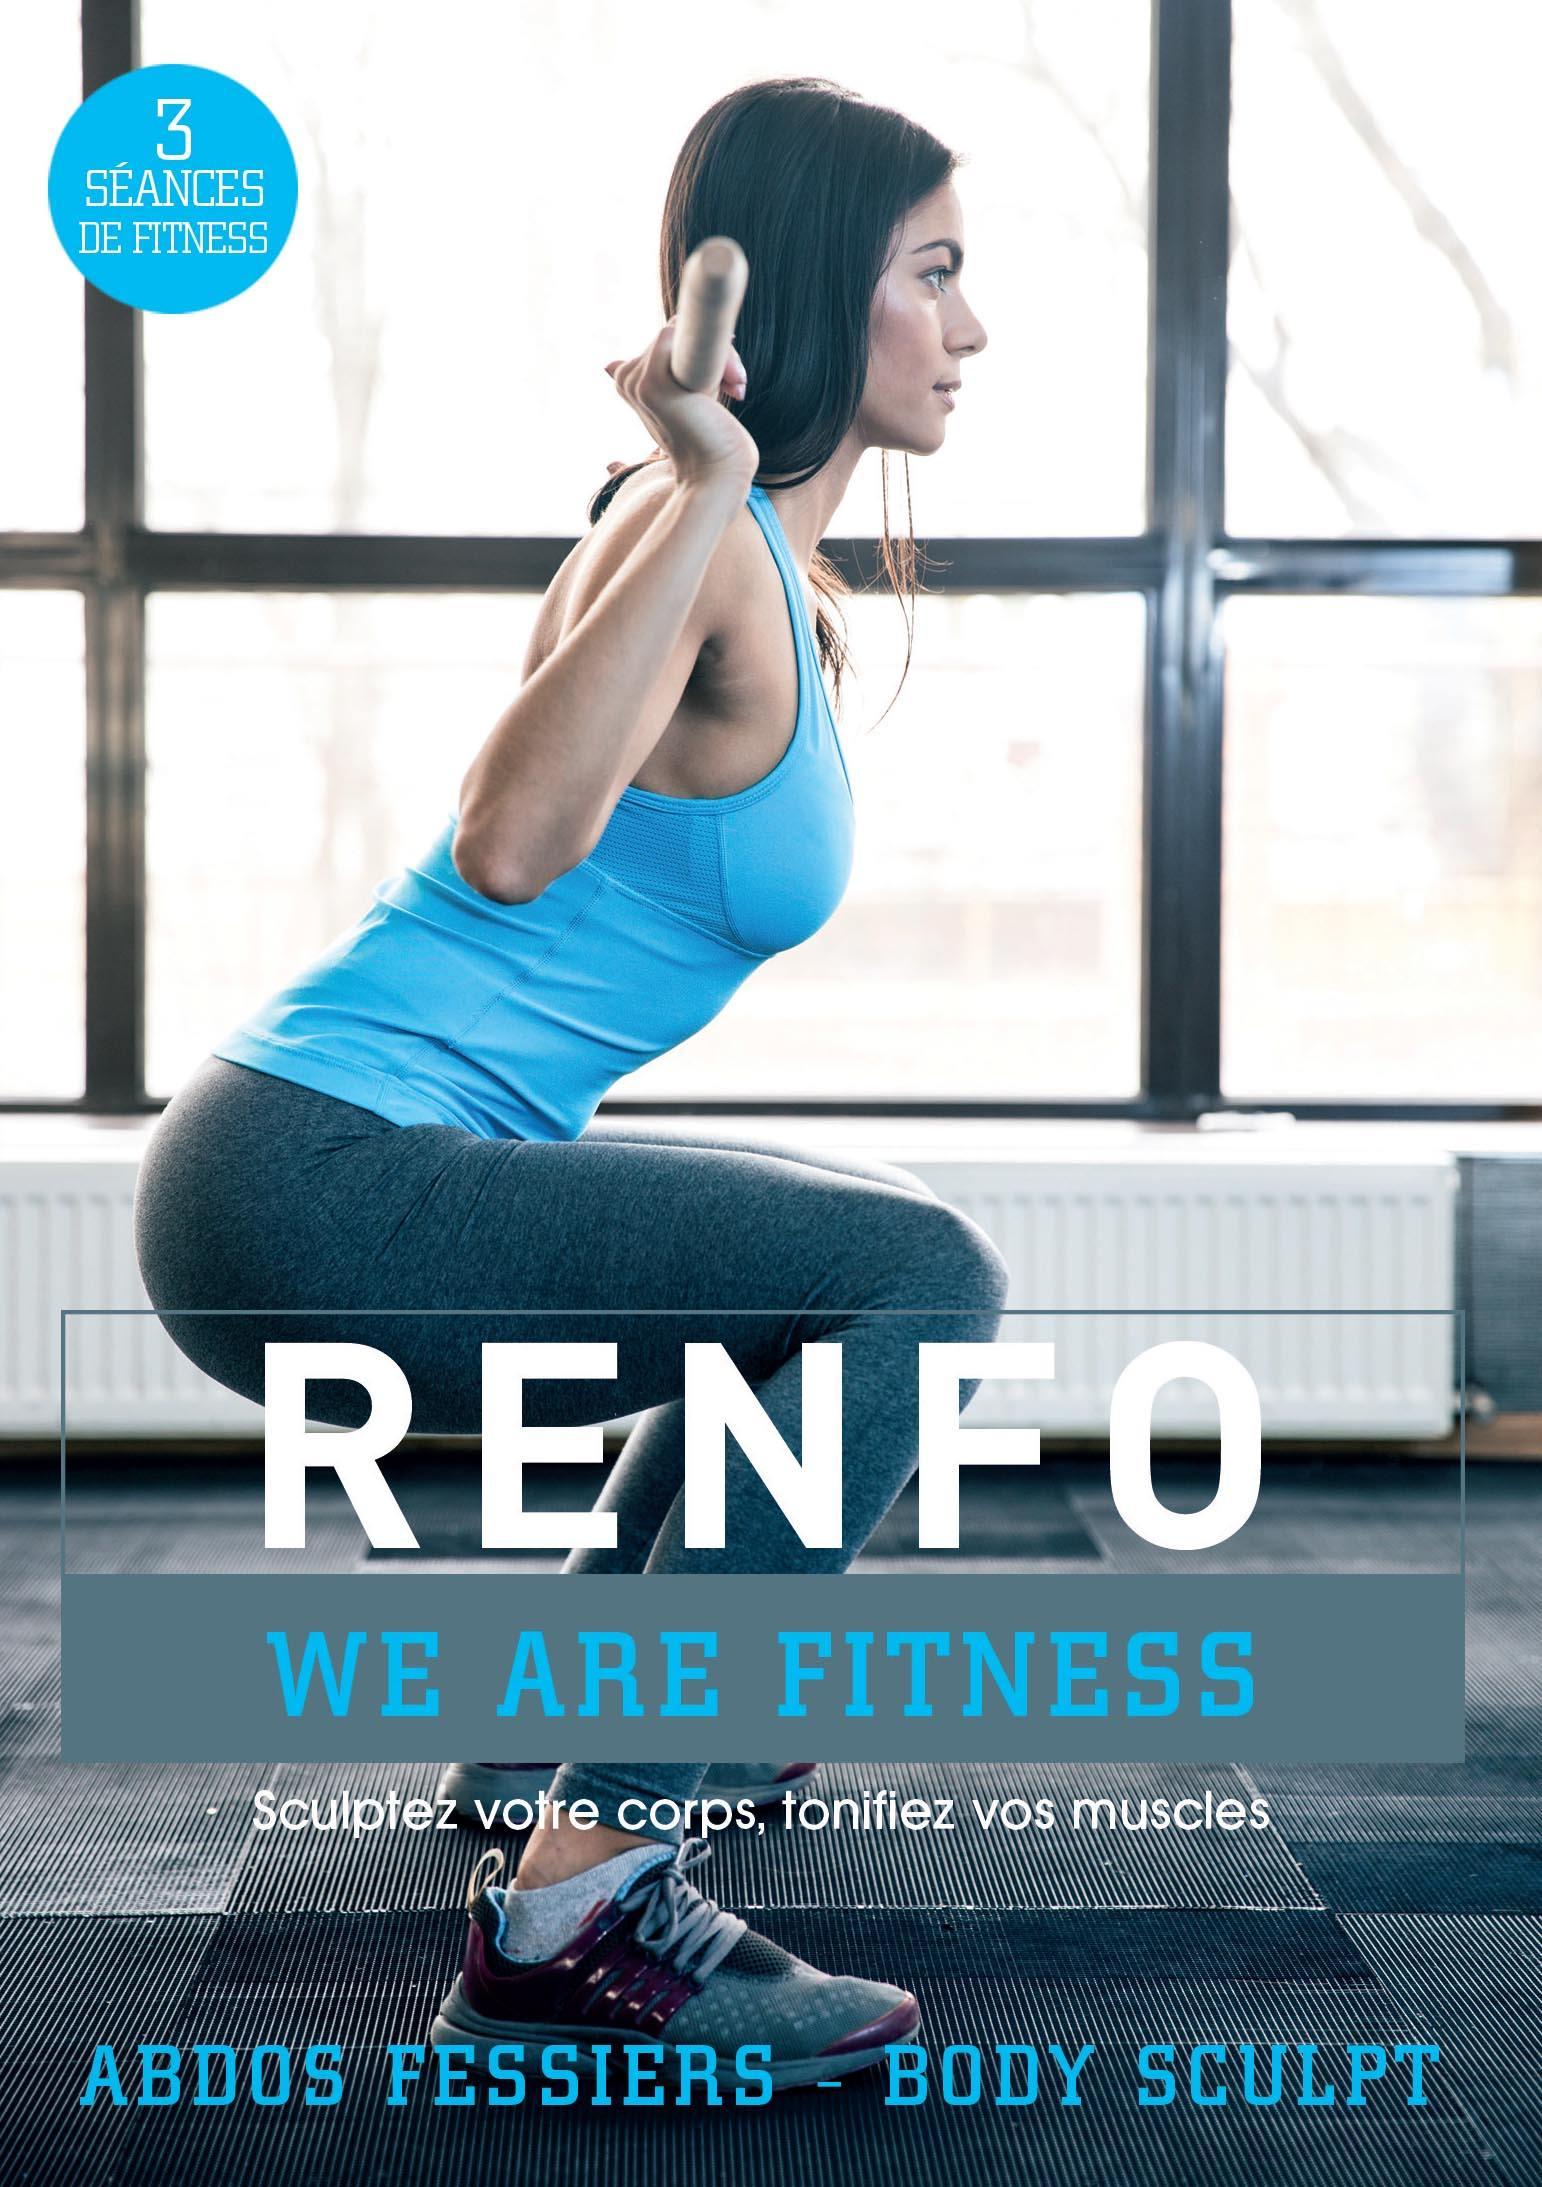 Renfo - abdos fessiers - body sculpt - core training - dvd